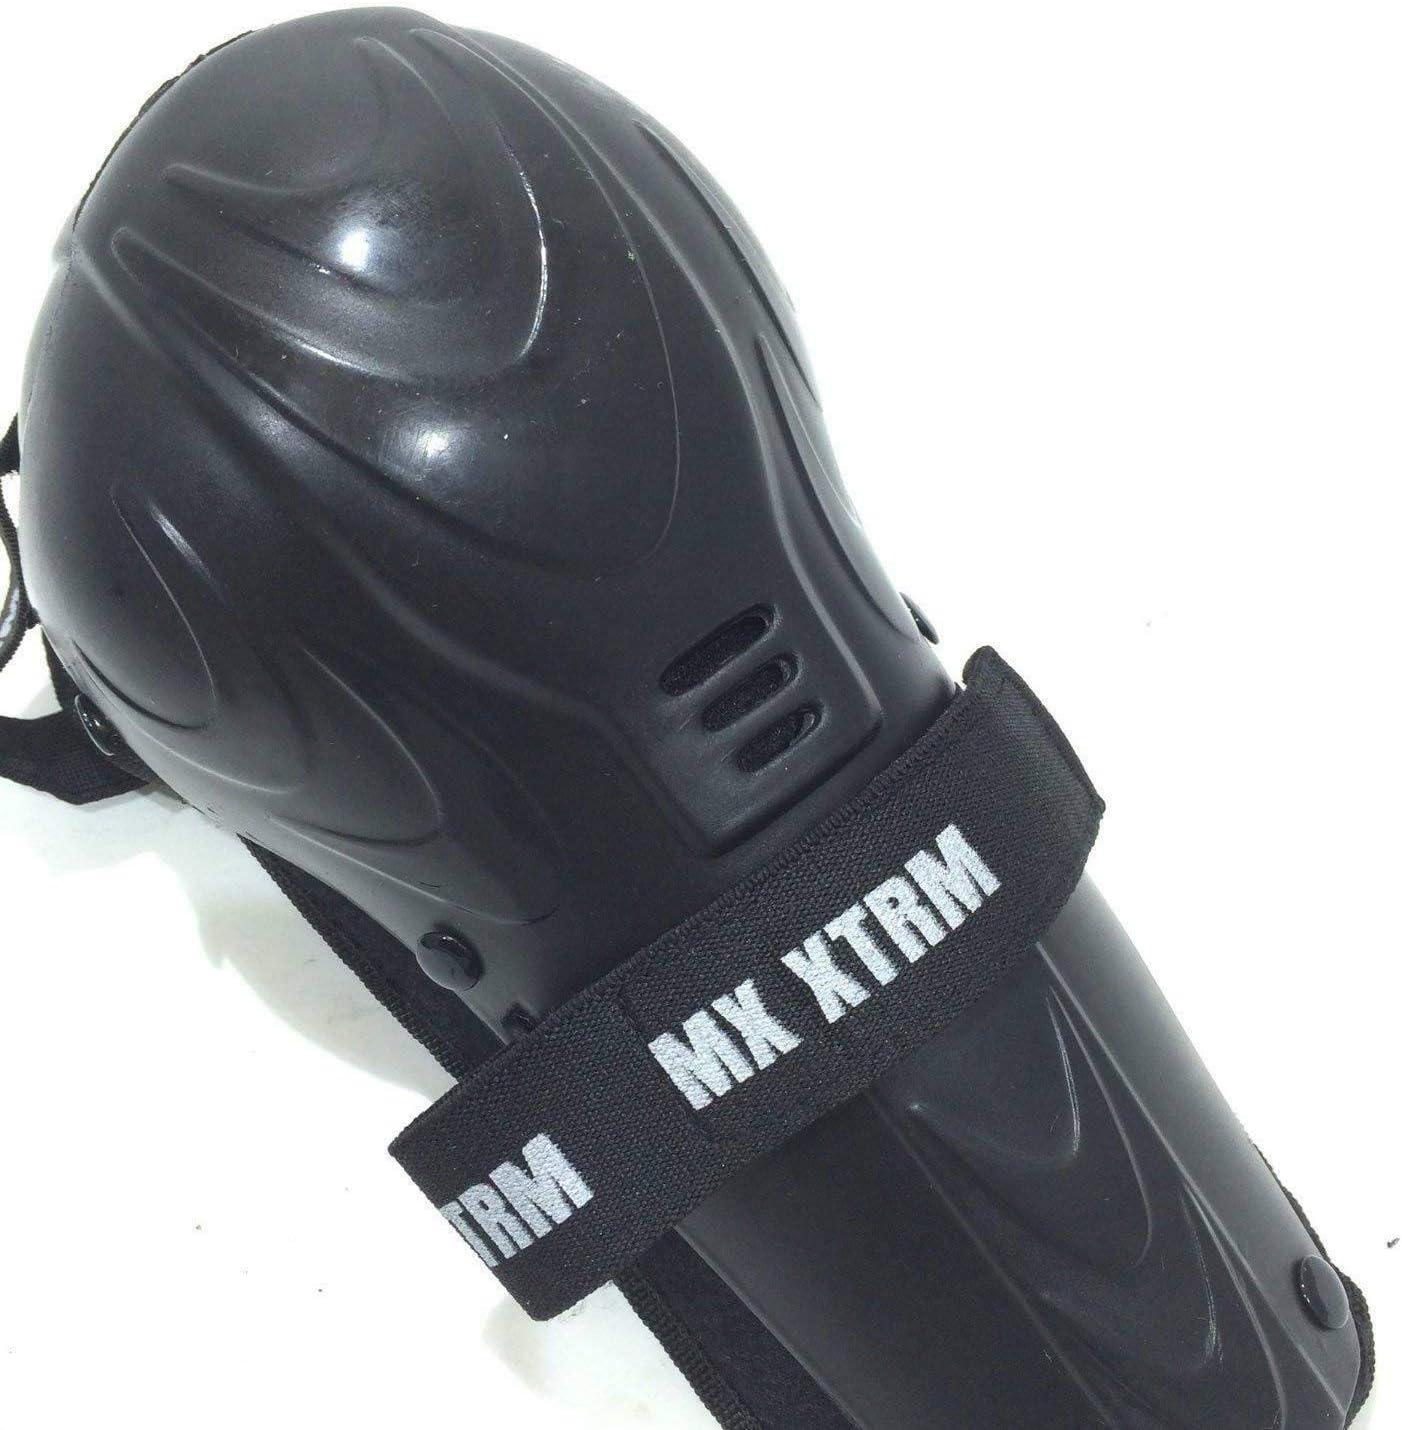 Neck Brace Junior Mx Kit Childrens Quad ATV Off Road Knee Guards Bolt Core-4 Kids Body Armour Motocross Protective Jacket